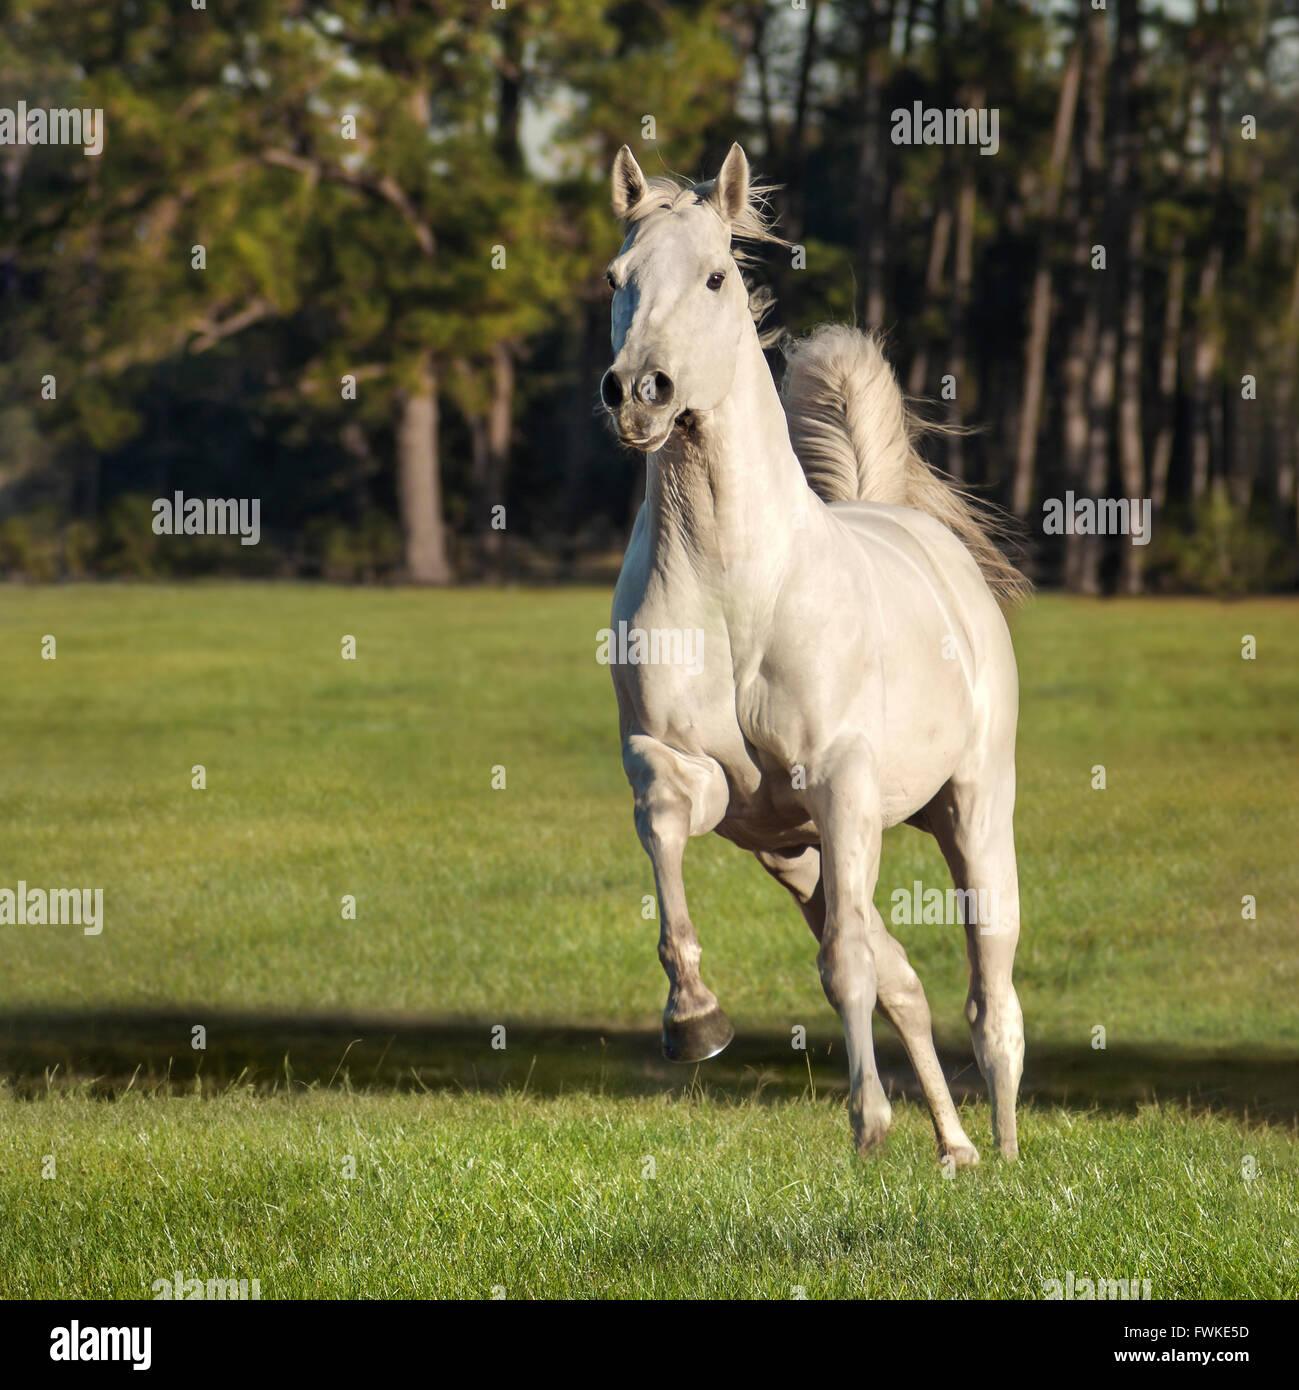 Thoroughbred stallion horse gallops toward us - Stock Image